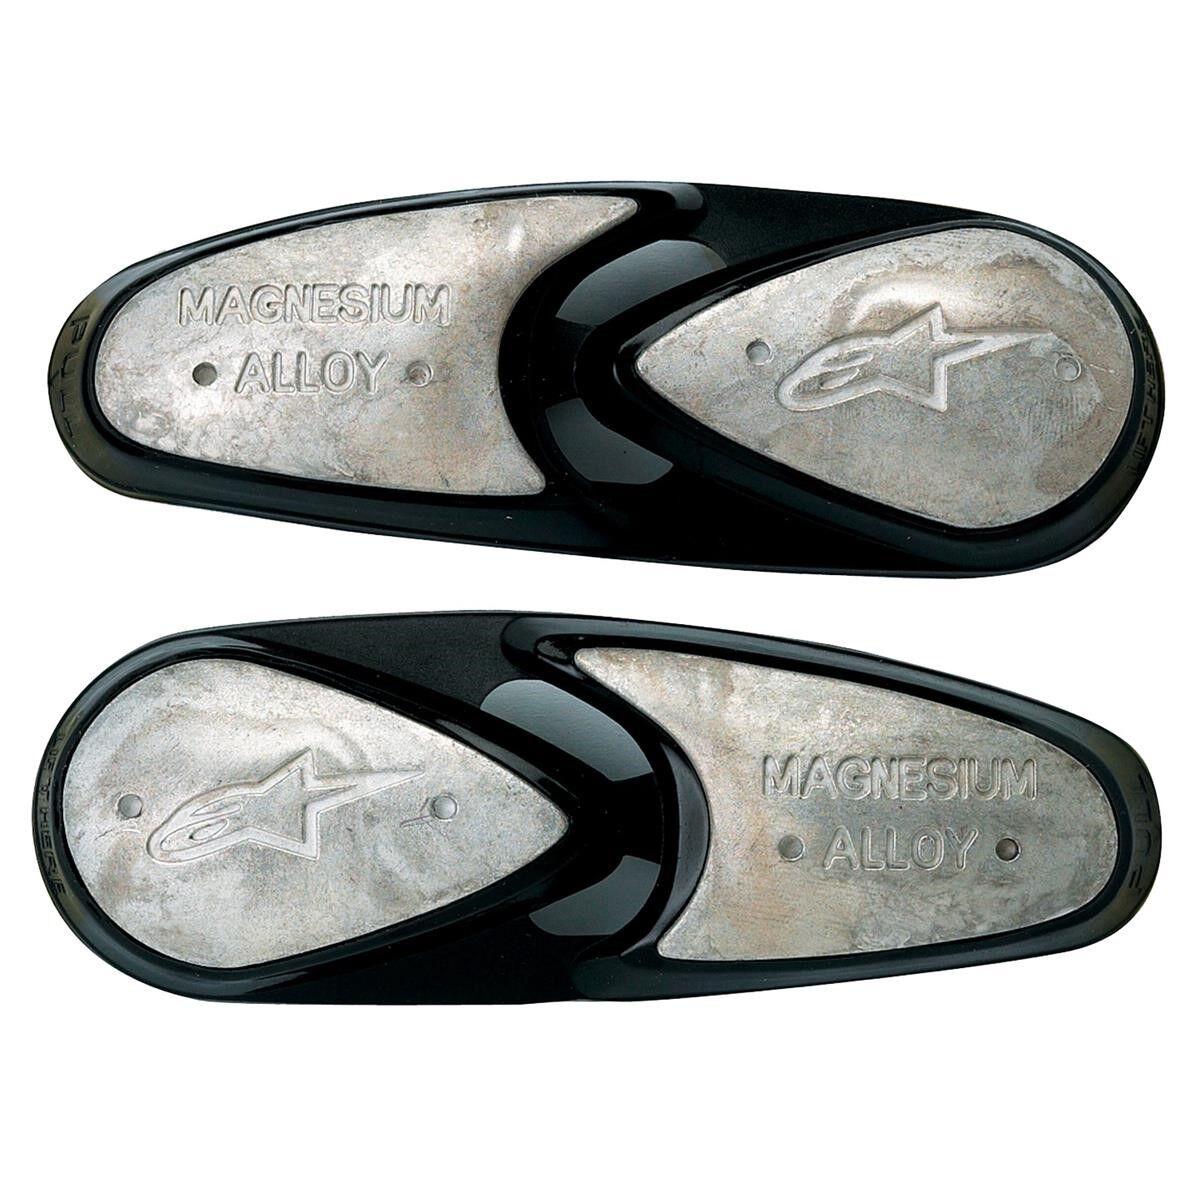 Alpinestars Kit Sliders de Rechange Magnesium Toe Slider - Taille unique - Argent